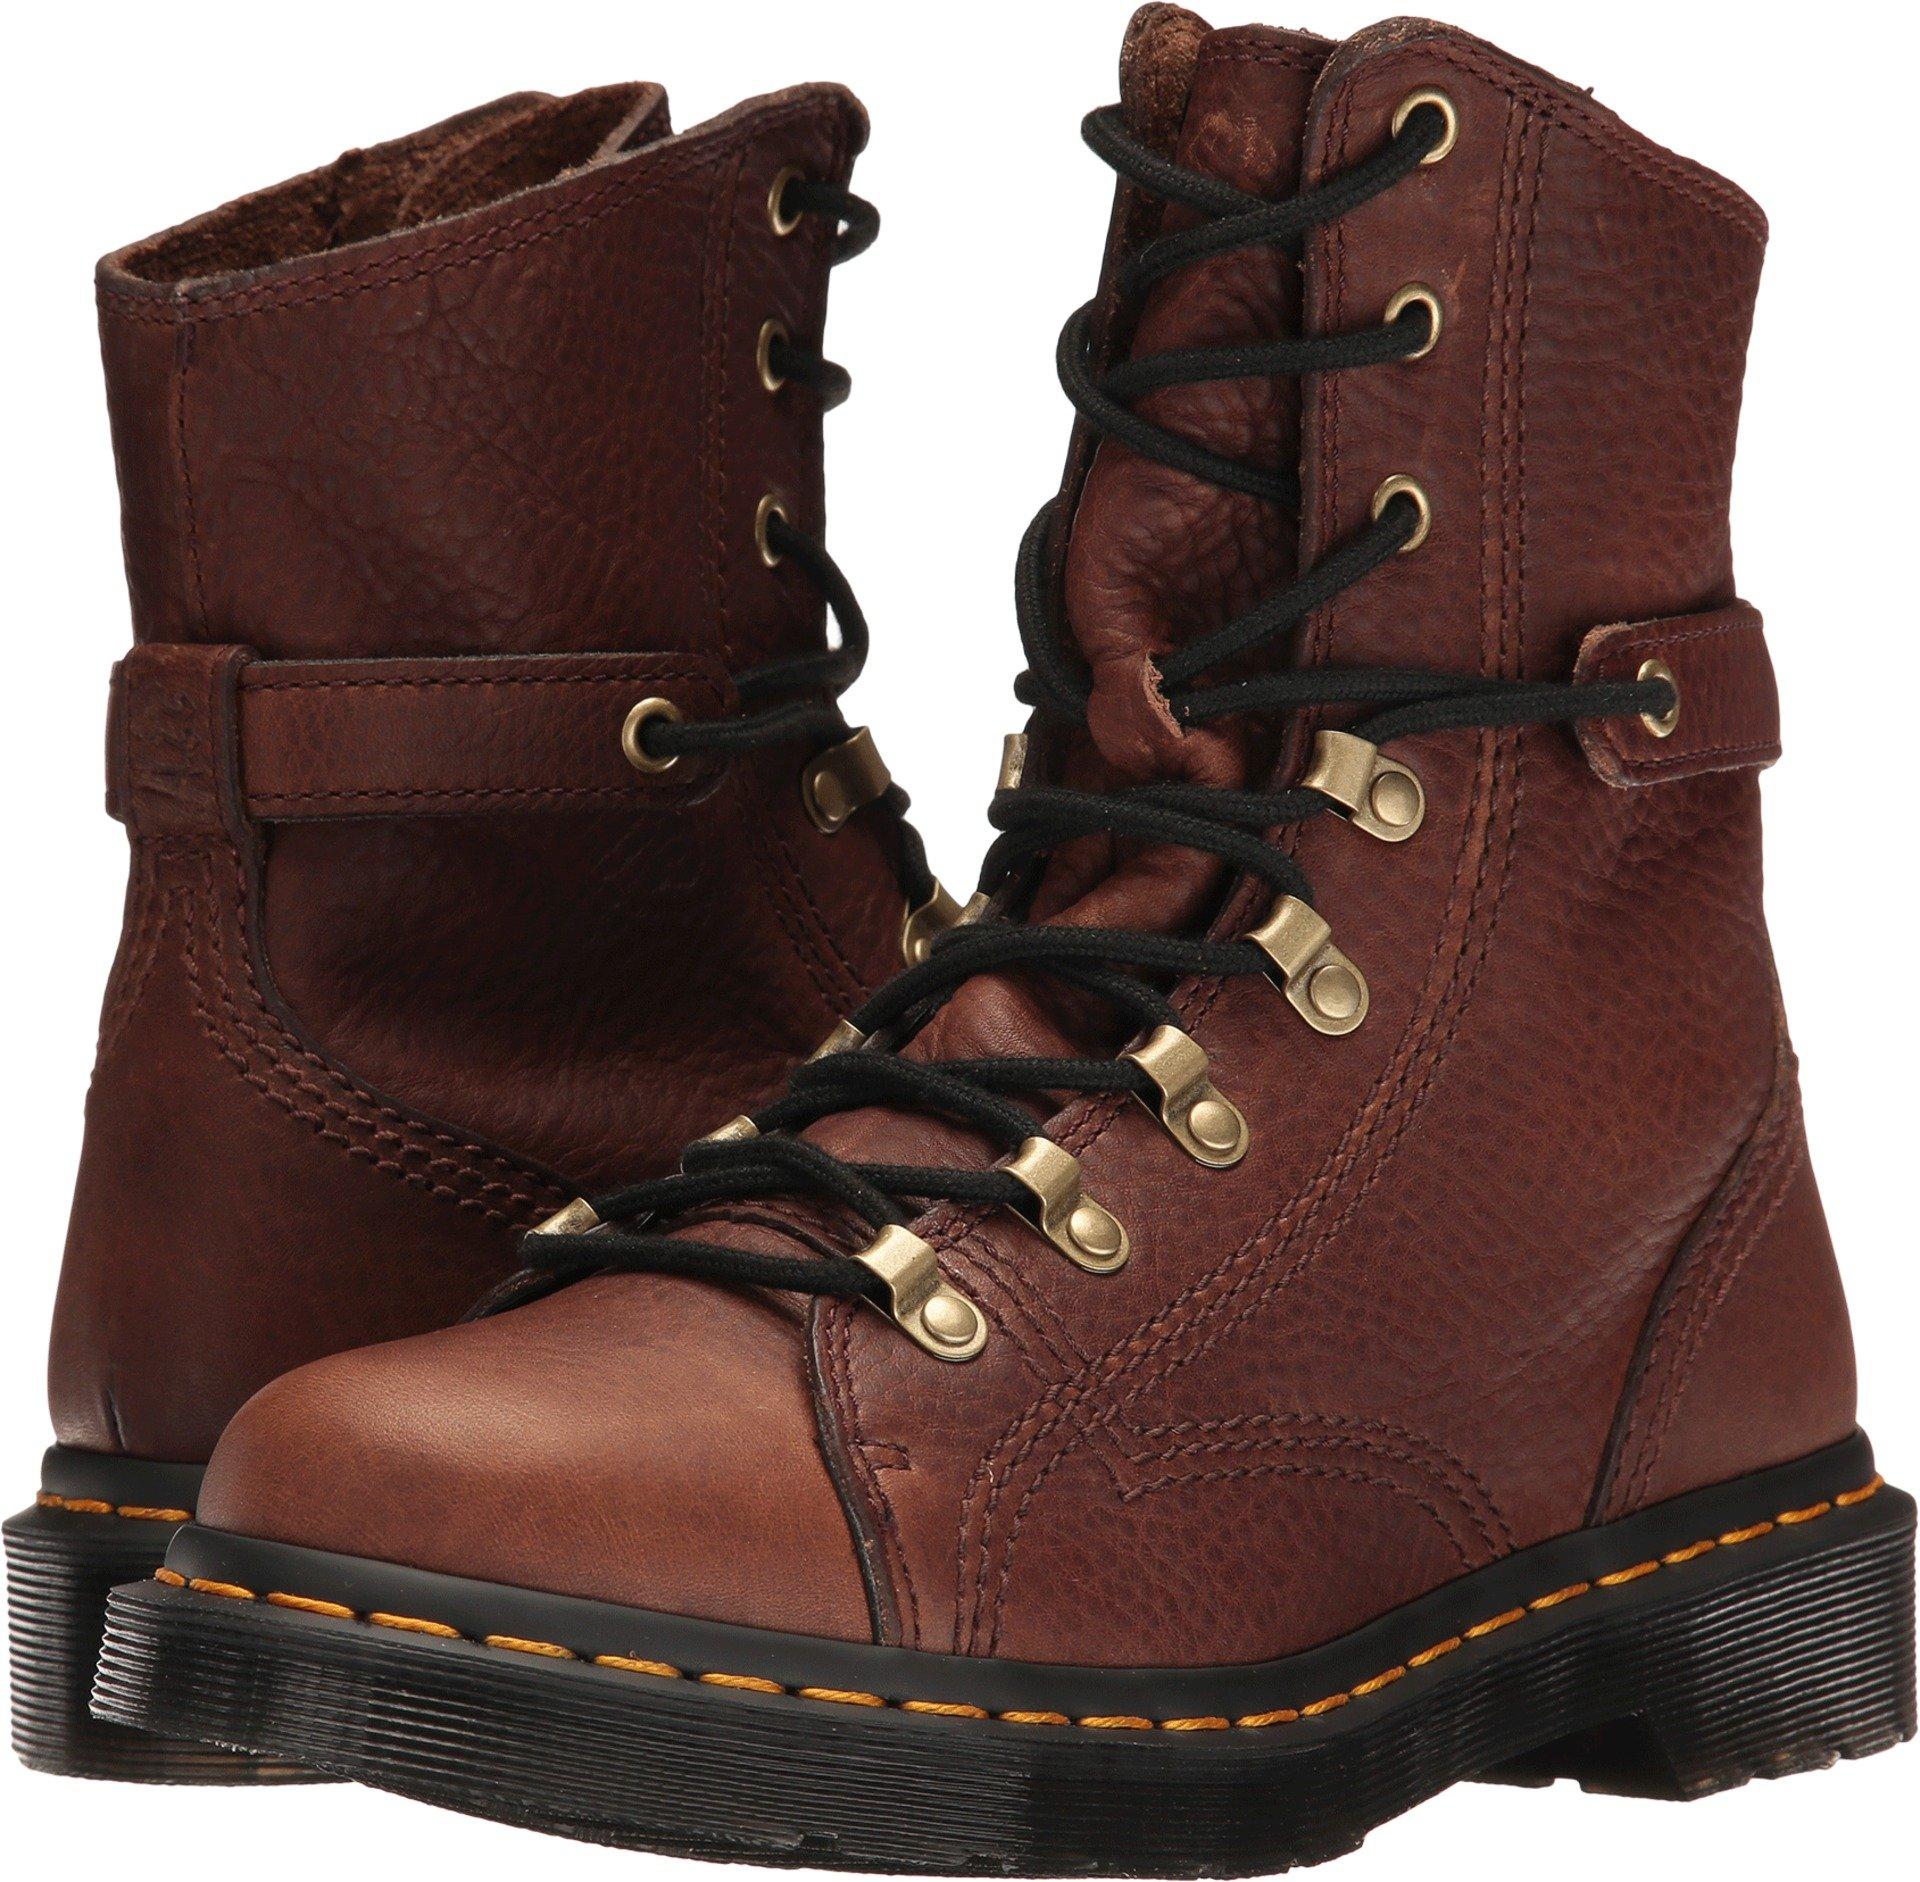 Dr. Martens Women's Coraline in Dark Brown Gizzly Leather Combat Boot, Dark Brown Grizzly, 7 Medium UK (9 US)